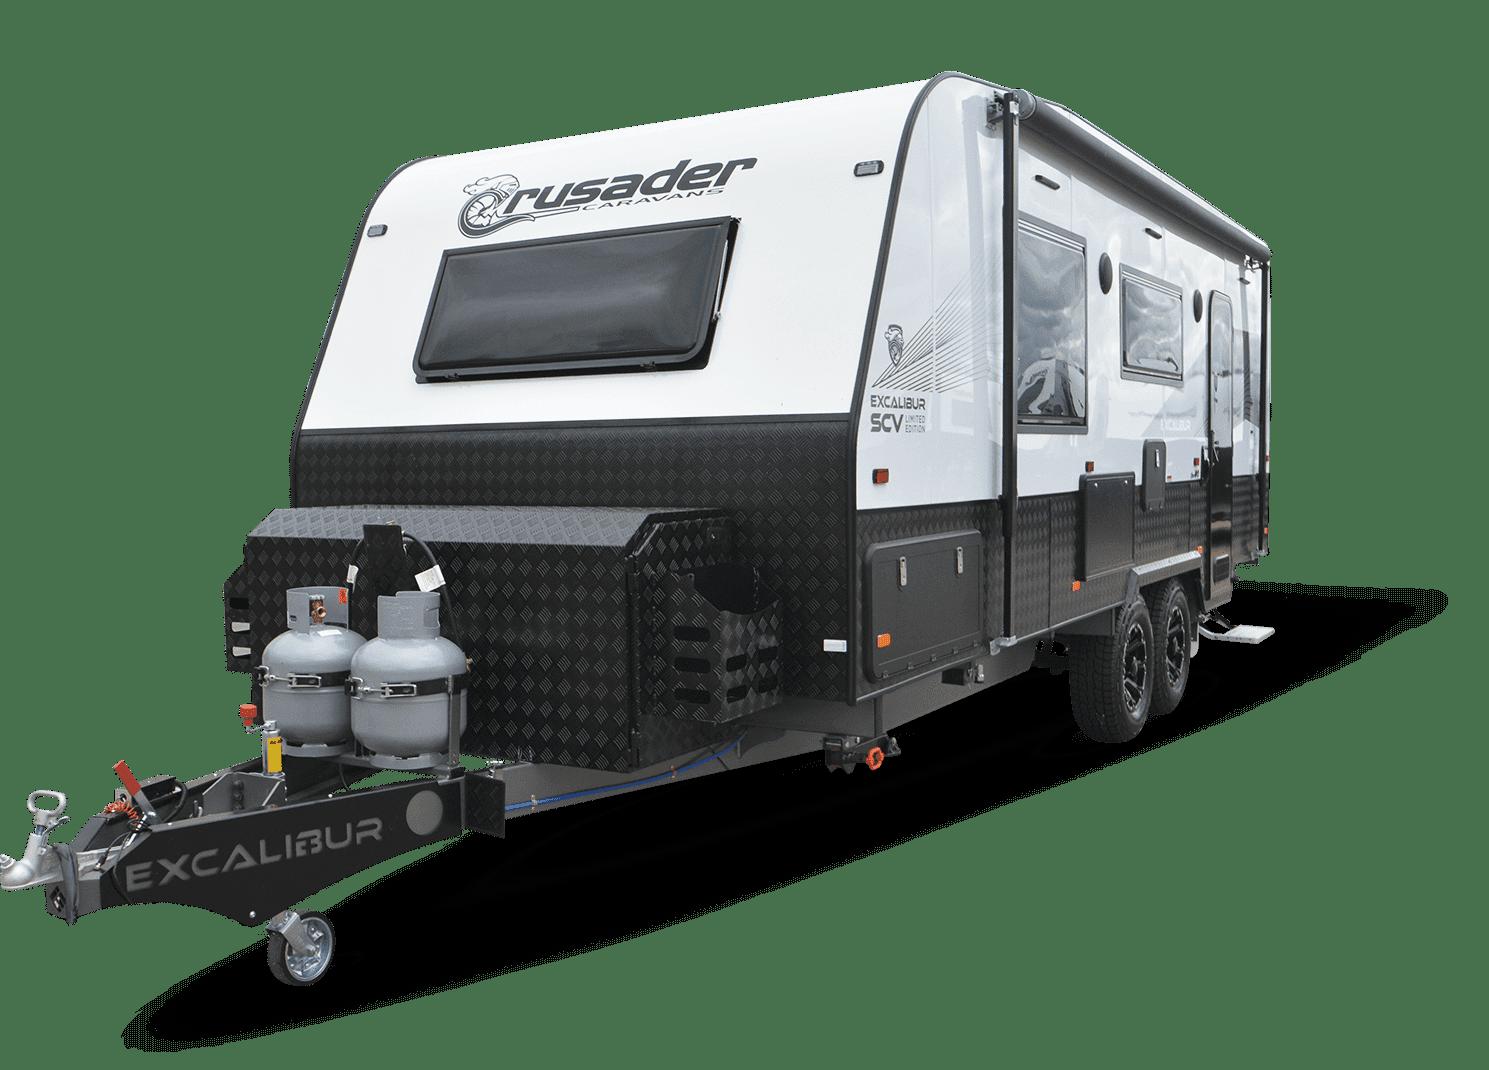 Image of Crusader Caravans Excalibur SCV.